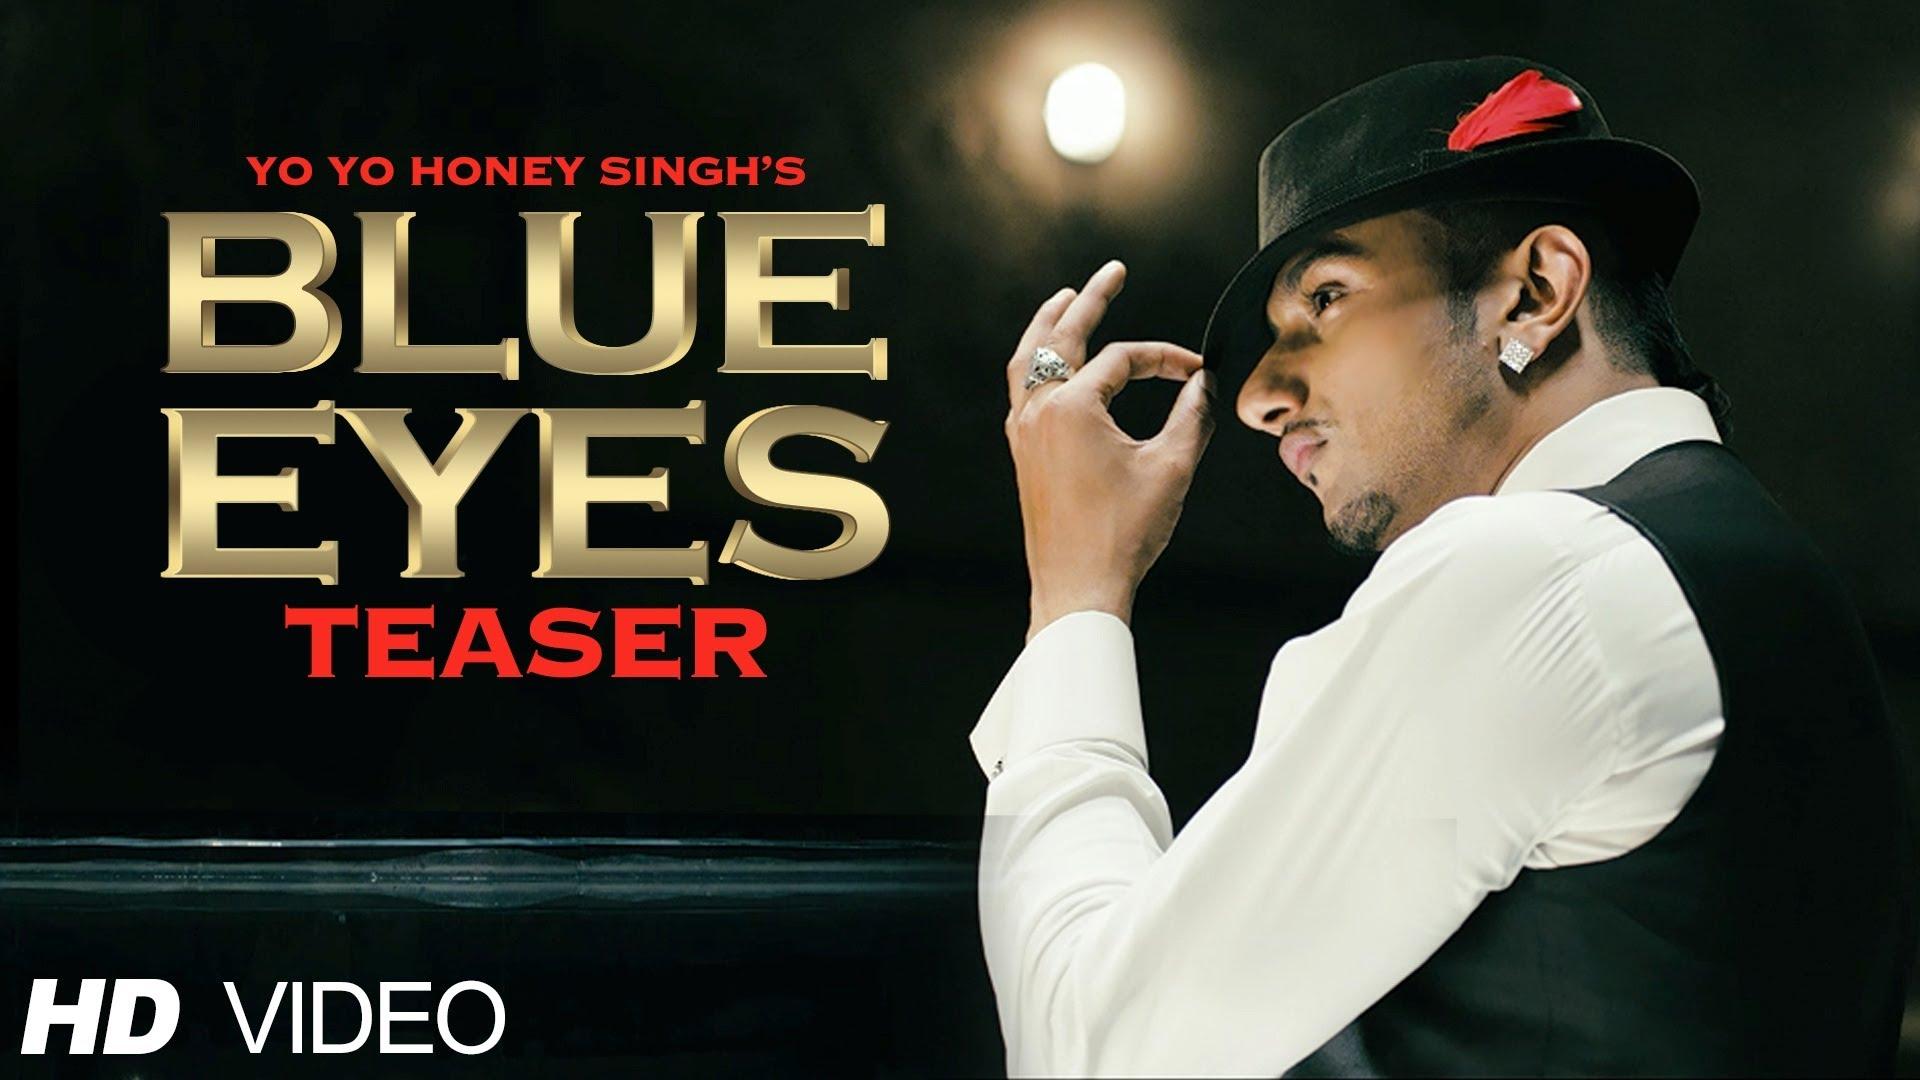 Bhangrareleases Com Cutting Edge Music News Yo Yo Honey Singh